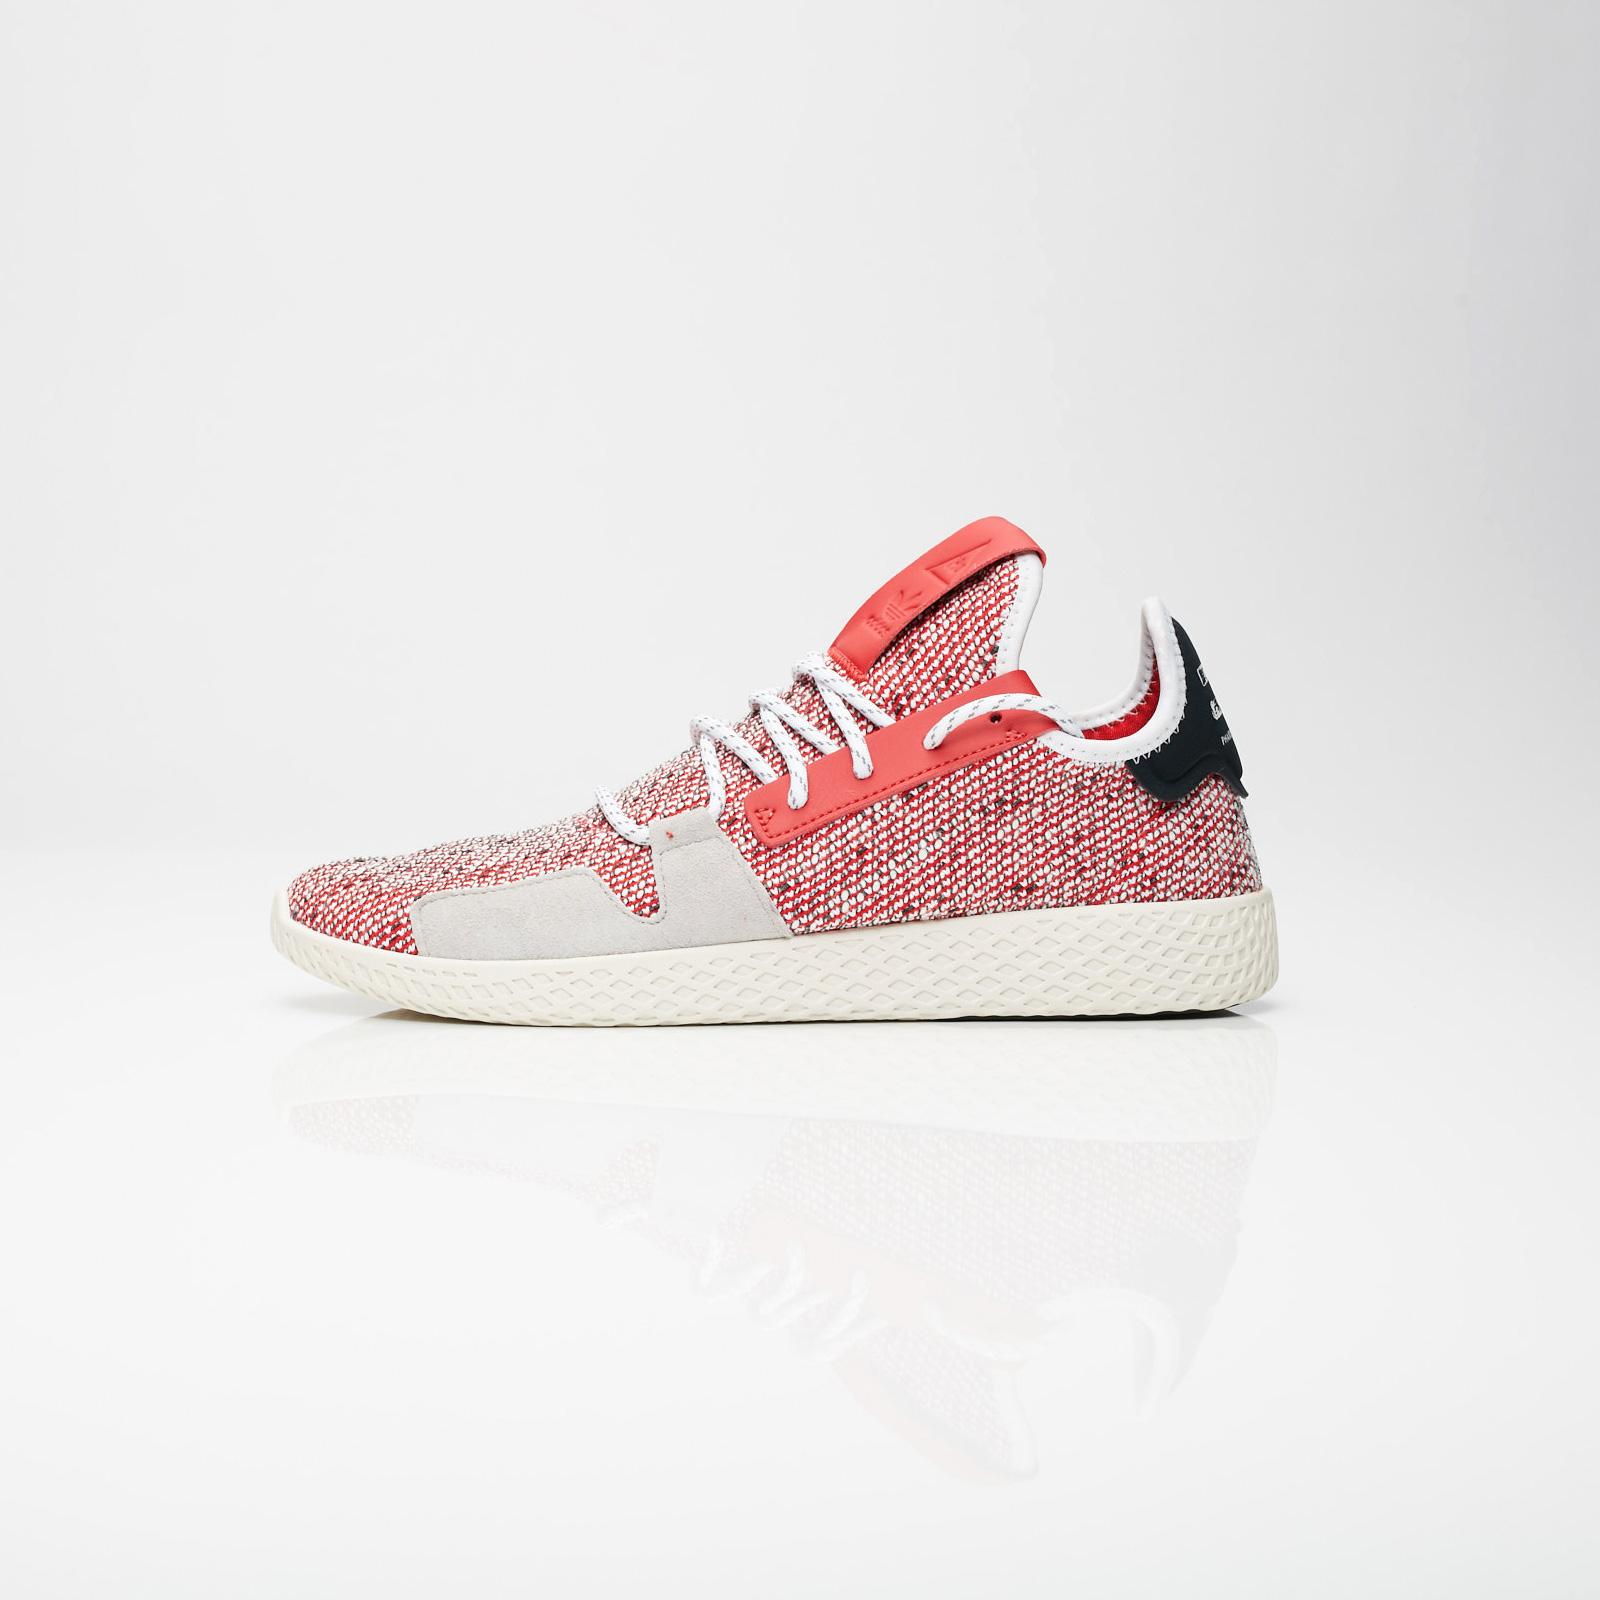 5d9b7fe5a adidas Solar Tennis HU V2 x Pharrell Williams - Bb9542 - Sneakersnstuff